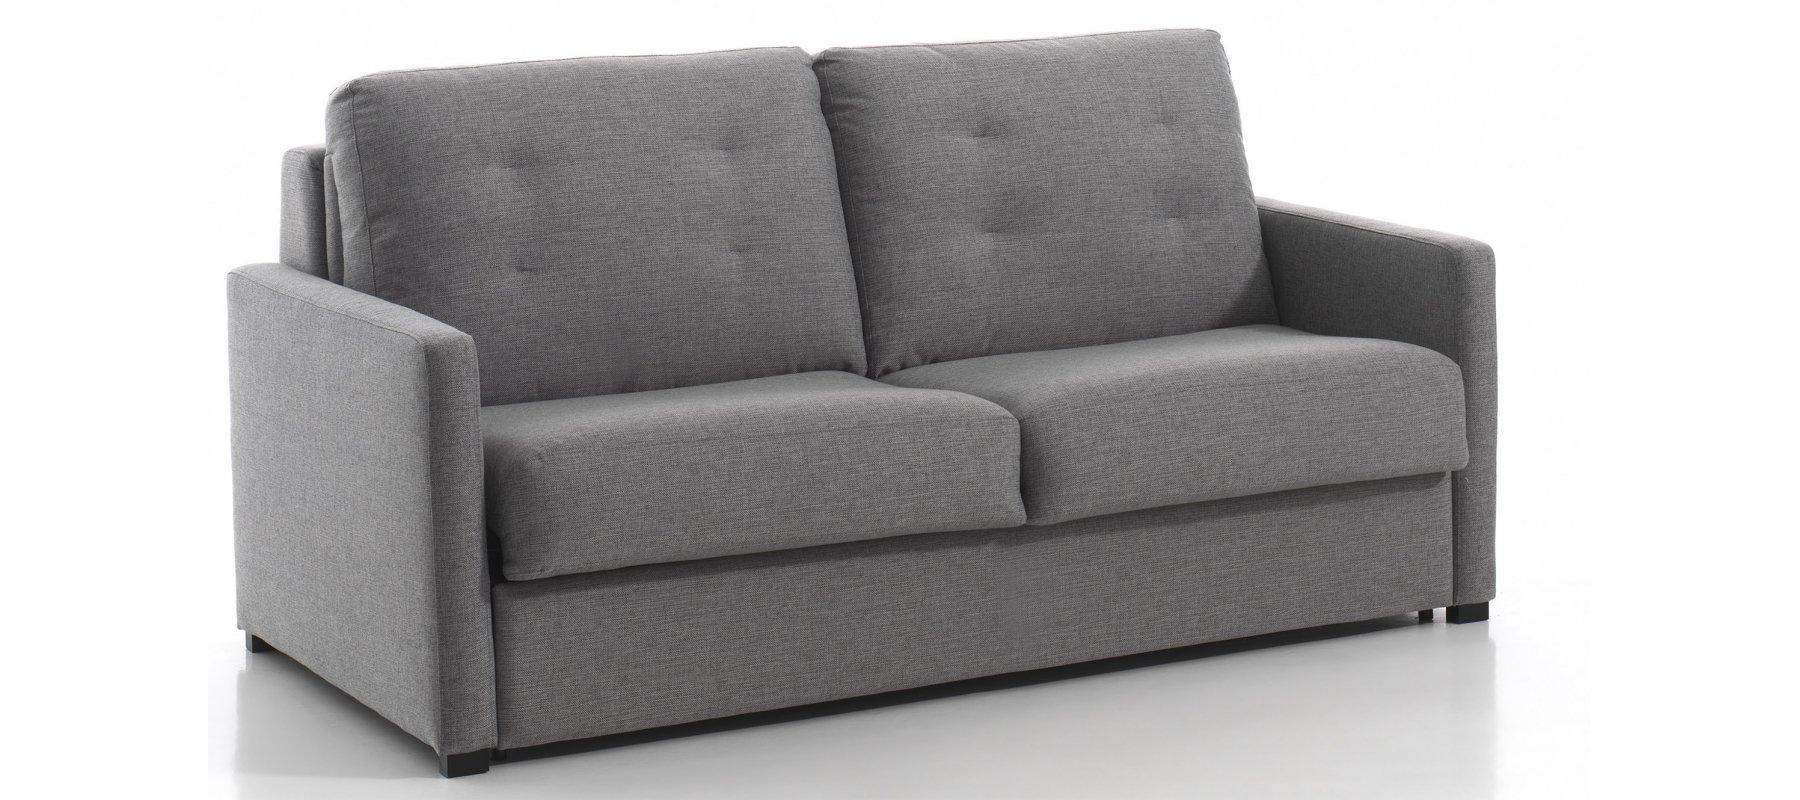 canap convertible tr s confortable nantes 4 places. Black Bedroom Furniture Sets. Home Design Ideas